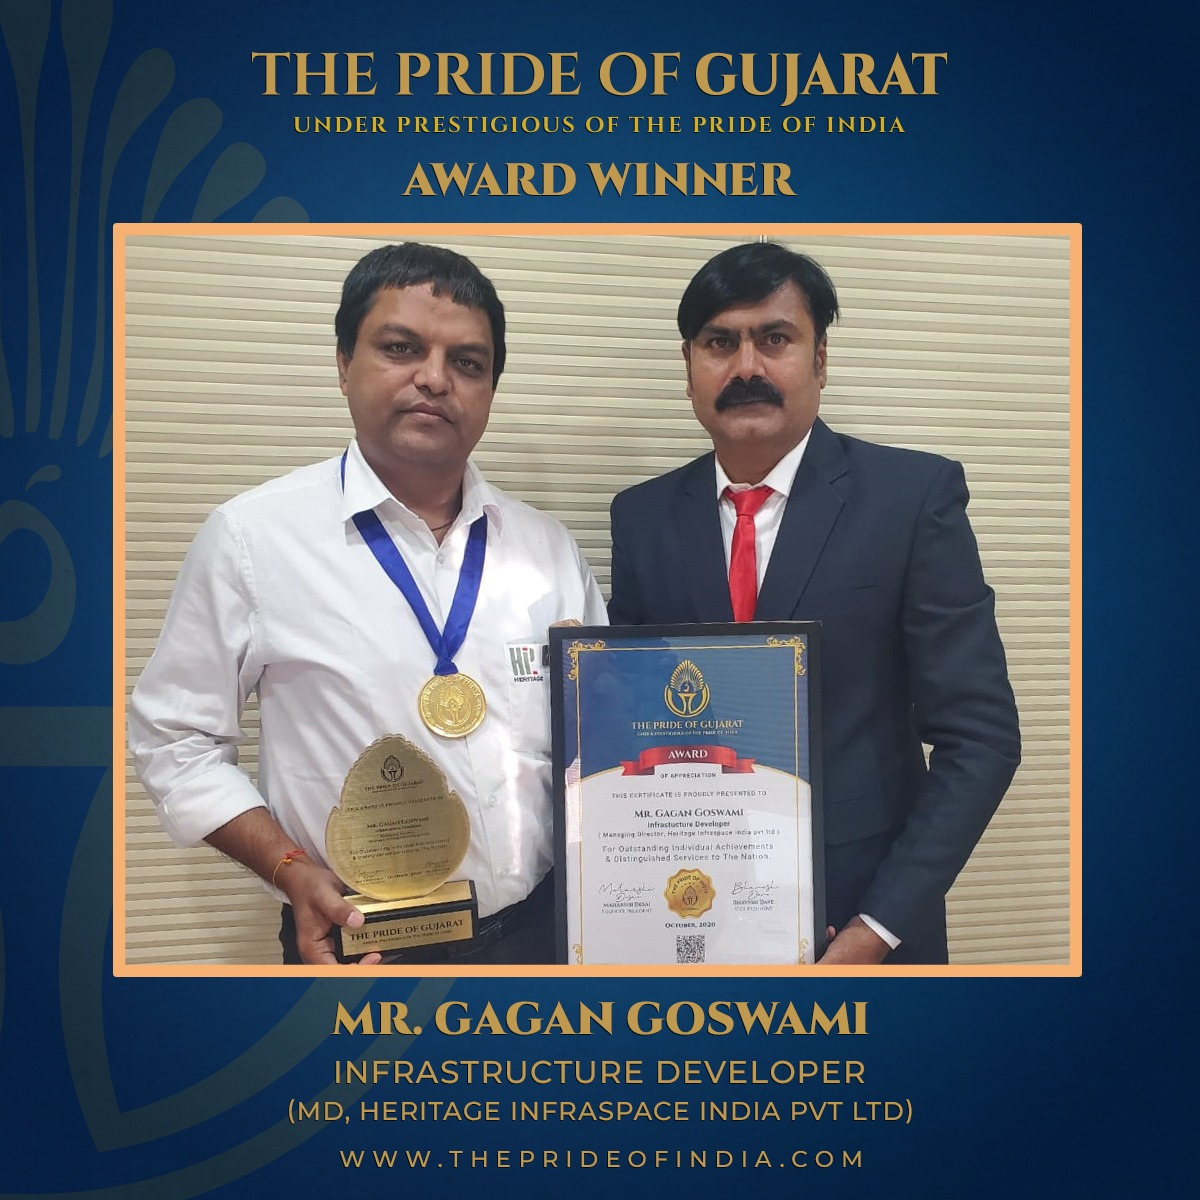 Gagan Goswami received the 'Pride of Gujarat Award' 2020 for fulfilling his social responsibility towards society